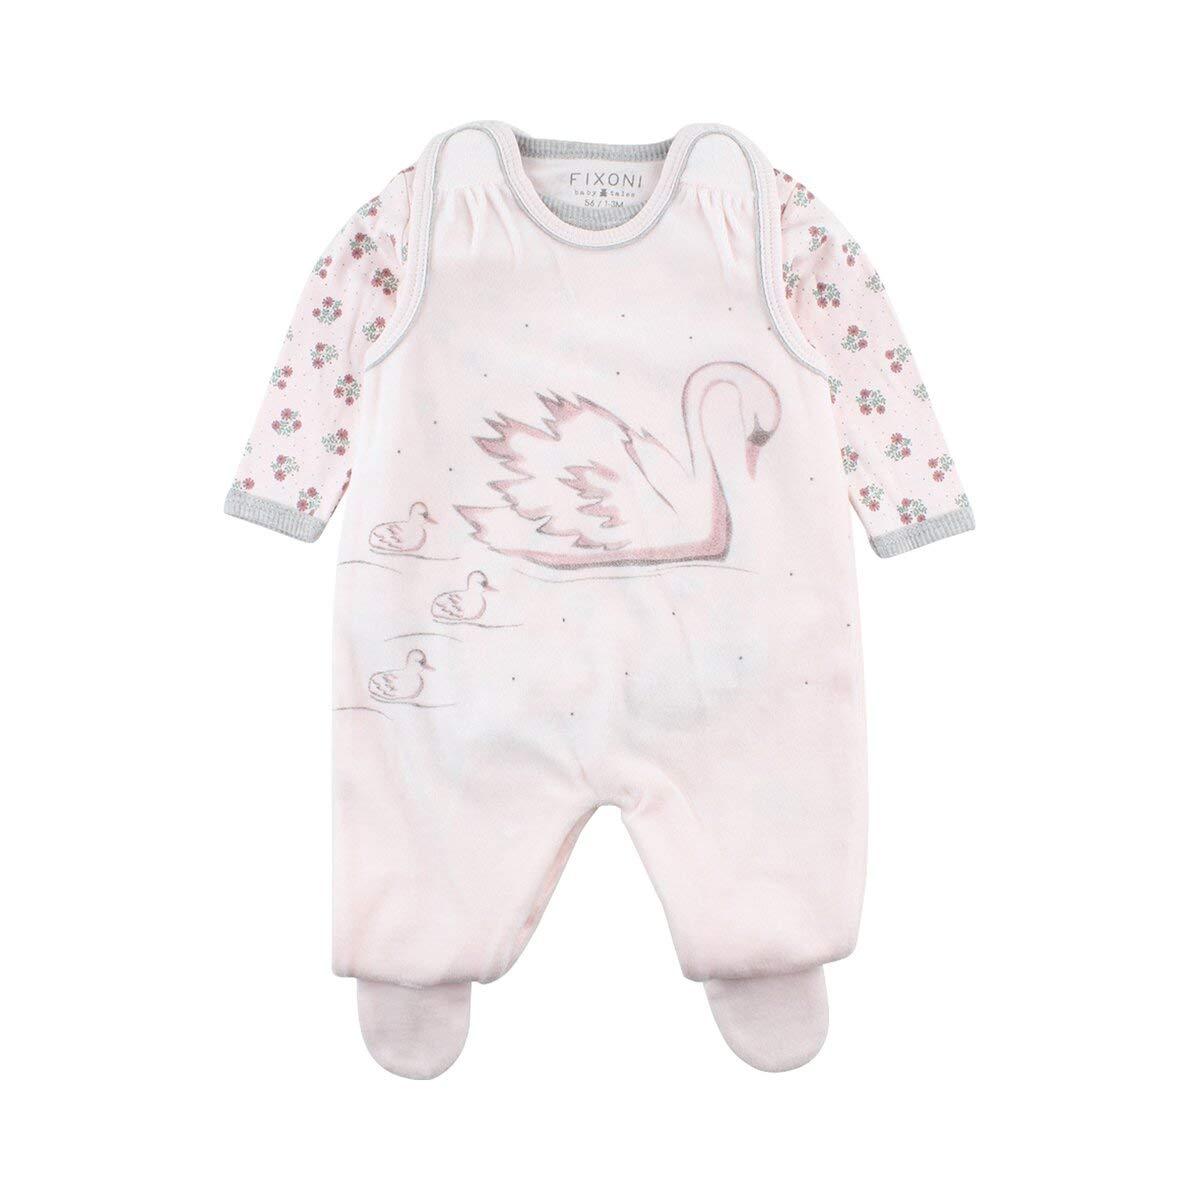 FIXONI Baby Girls' Hush Suitset-oekotex Footies 33229